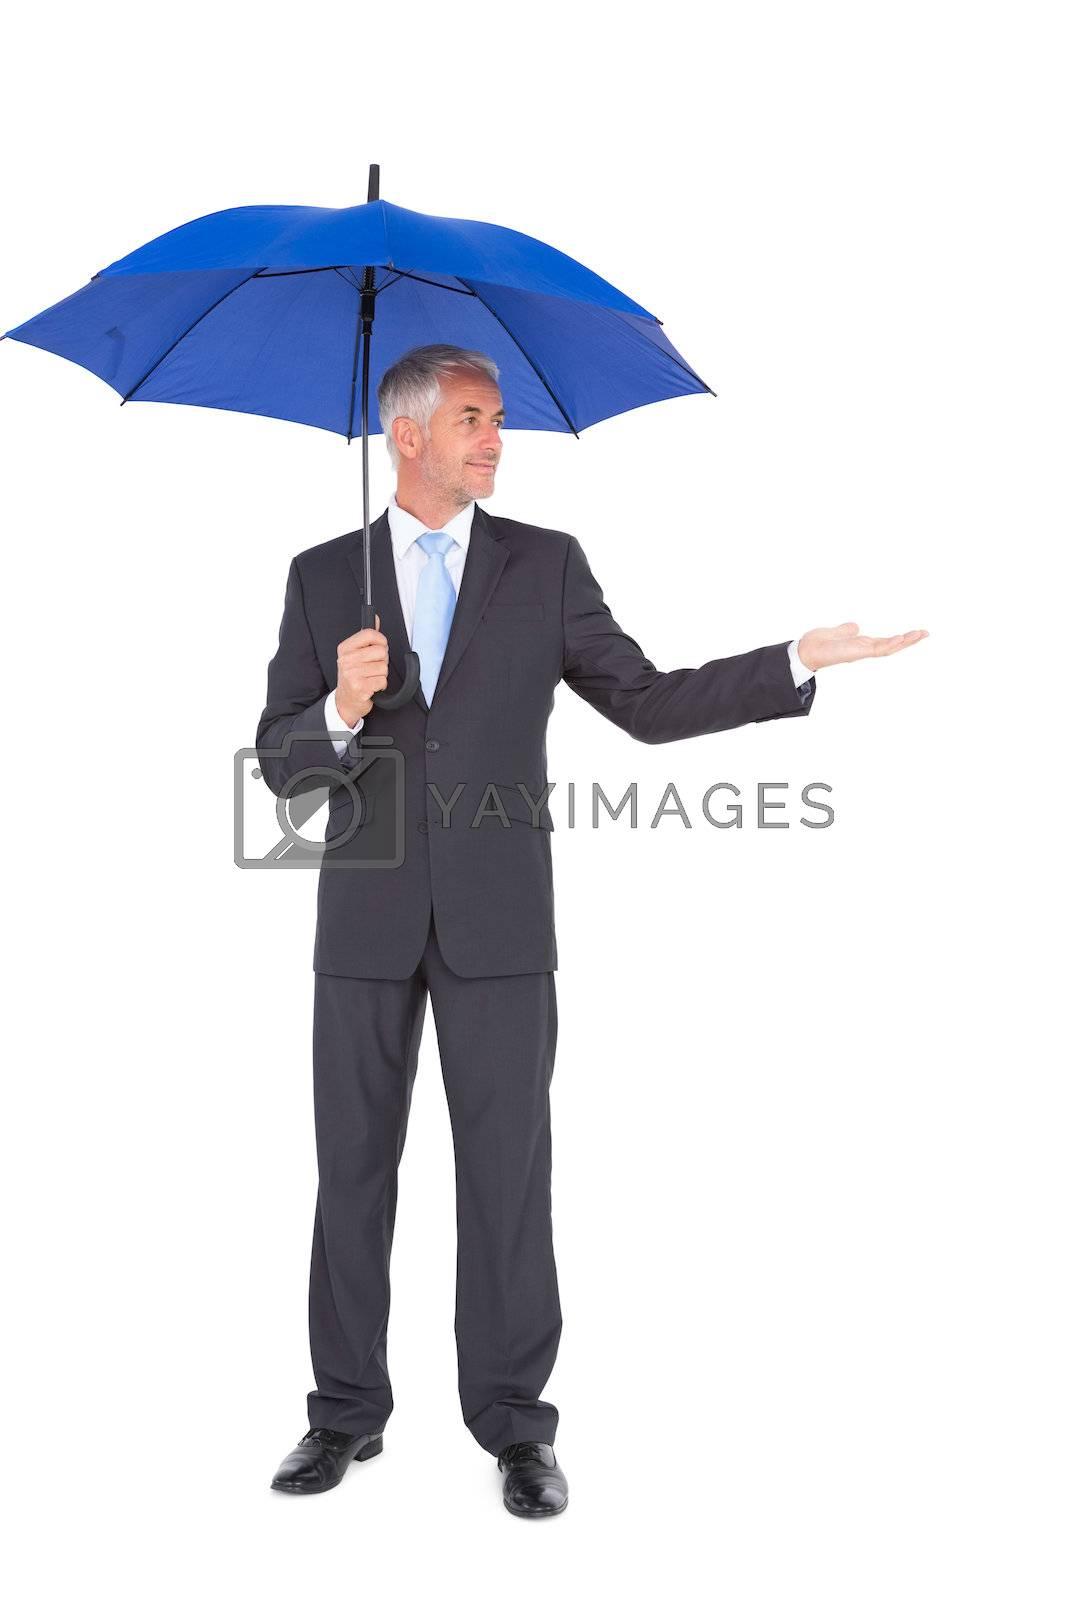 Peaceful businessman holding blue umbrella by Wavebreakmedia